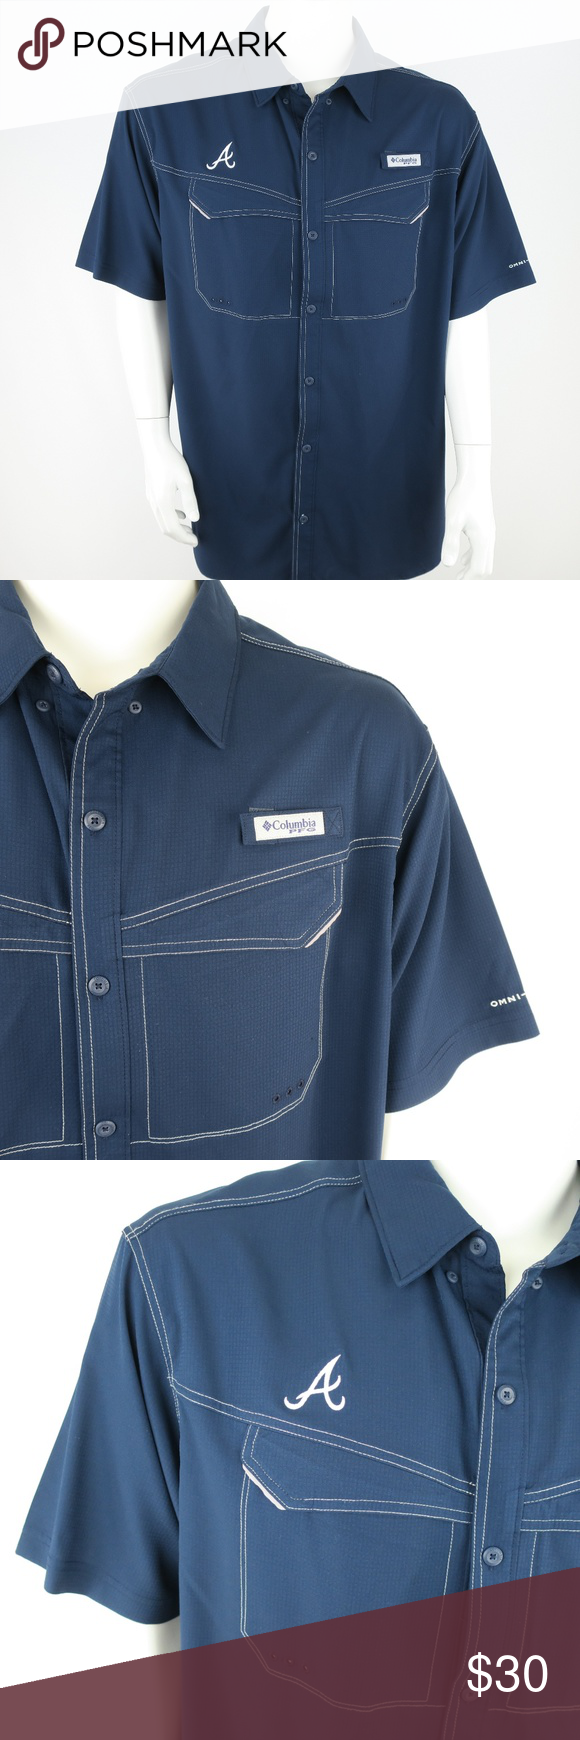 online retailer 632bd 362ba Columbia PFG Men's Vented Fishing Shirt Atlanta Br Columbia ...